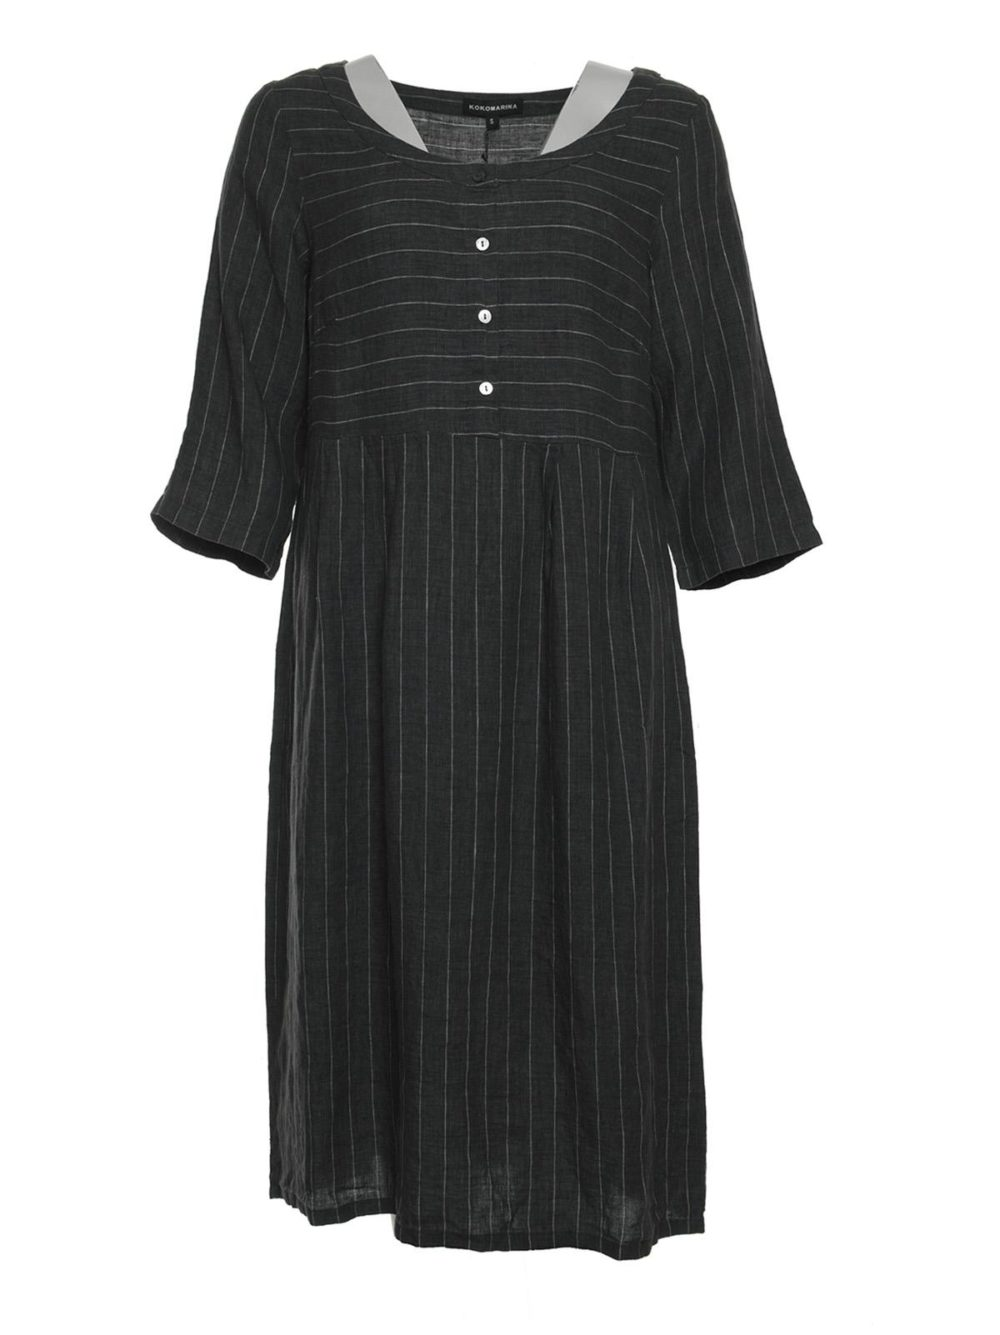 Nilaya Dress Kokomarina Katie Kerr Women's Clothing